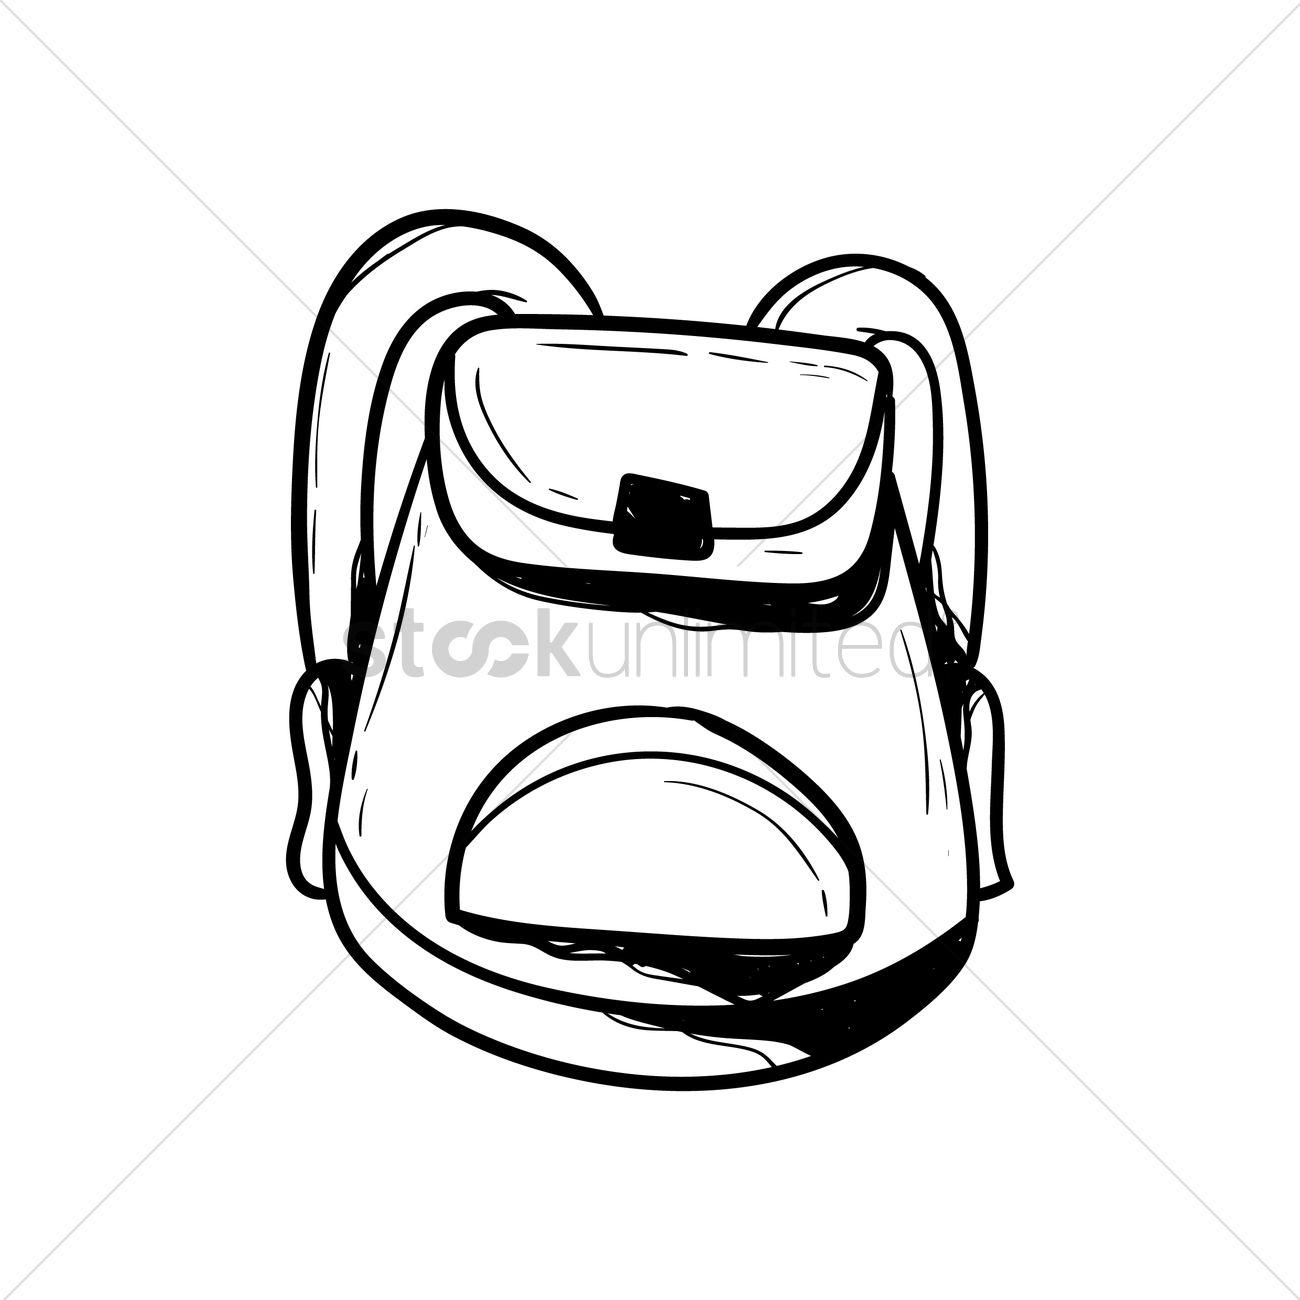 1300x1300 School Bag Vector Image